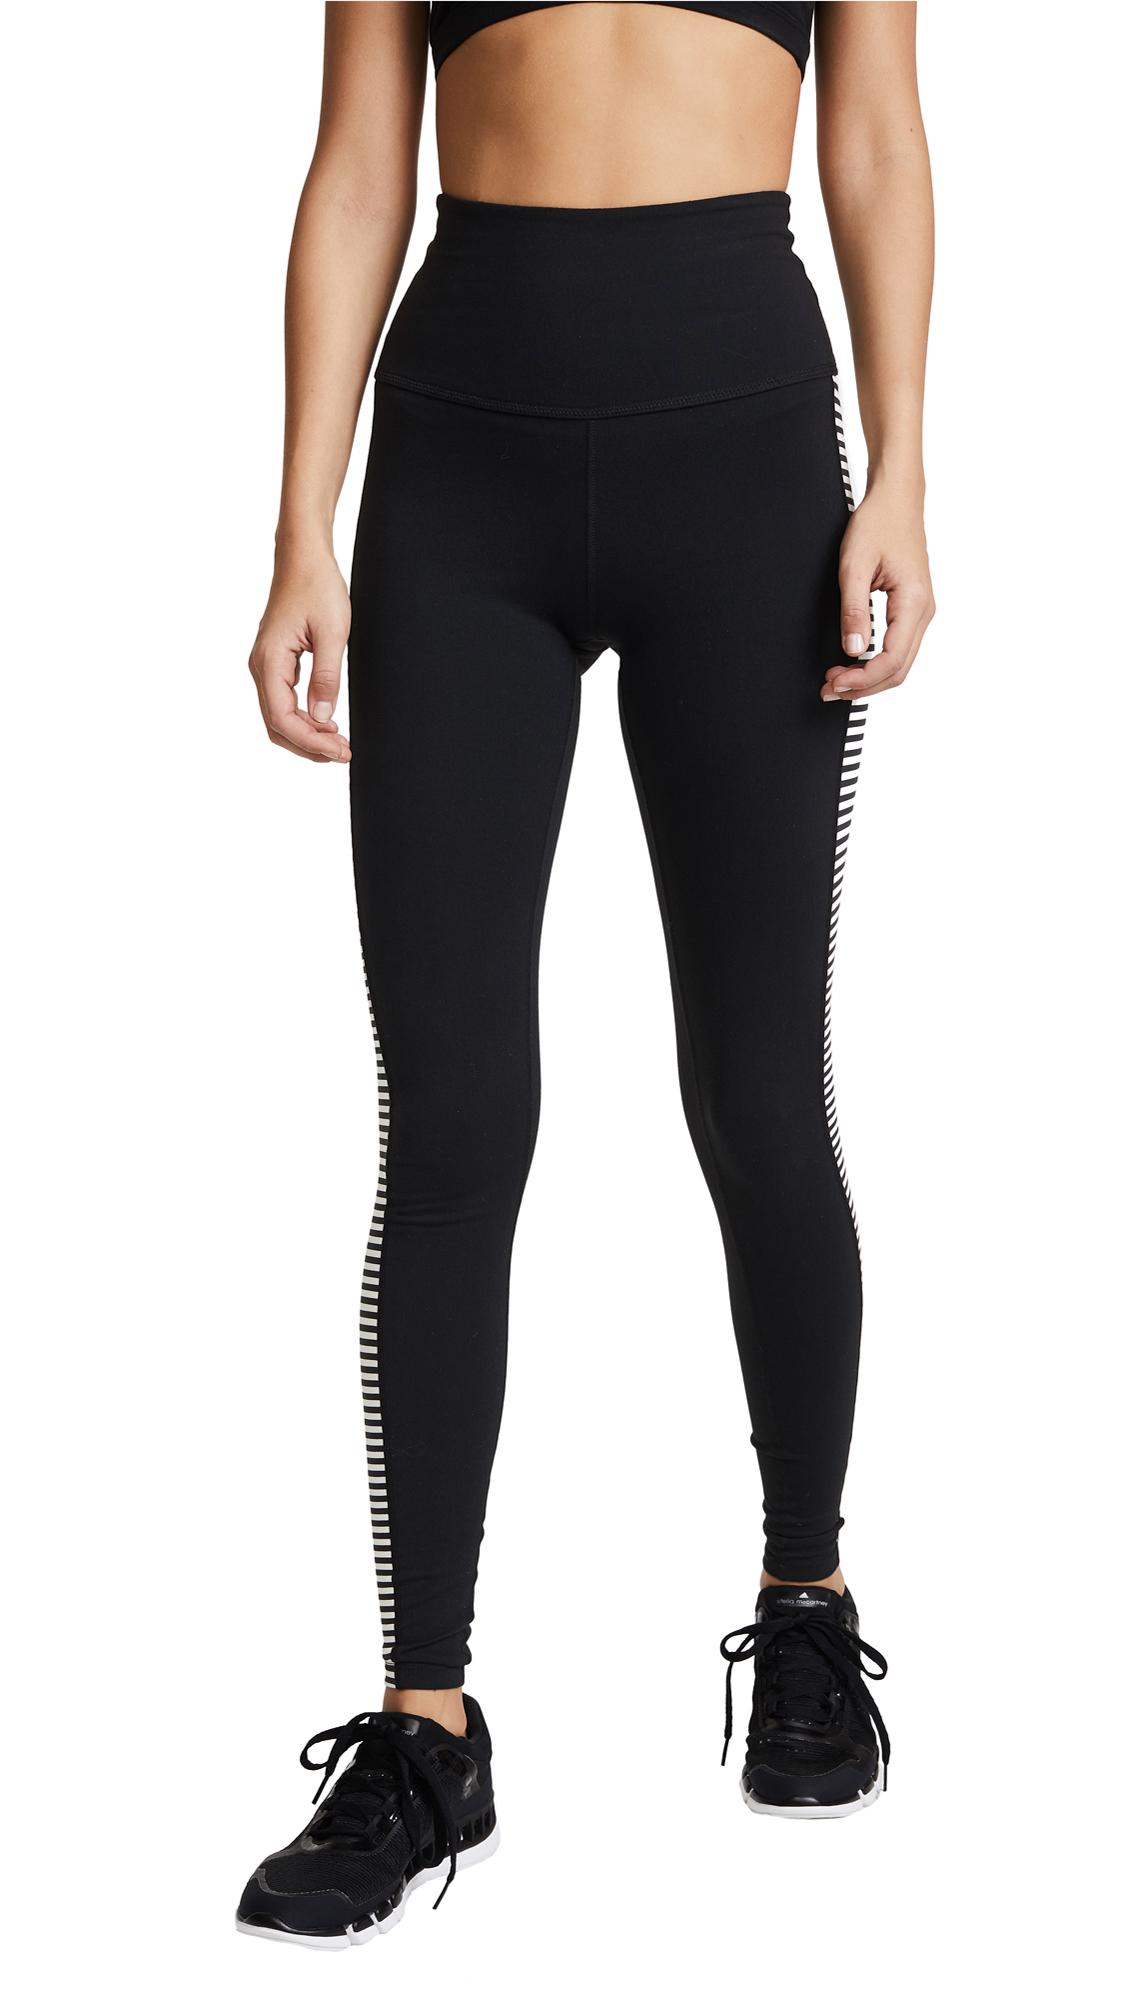 Beyond Yoga x Kate Spade New York Saturday Stripe Leggings - Saturday Stripe